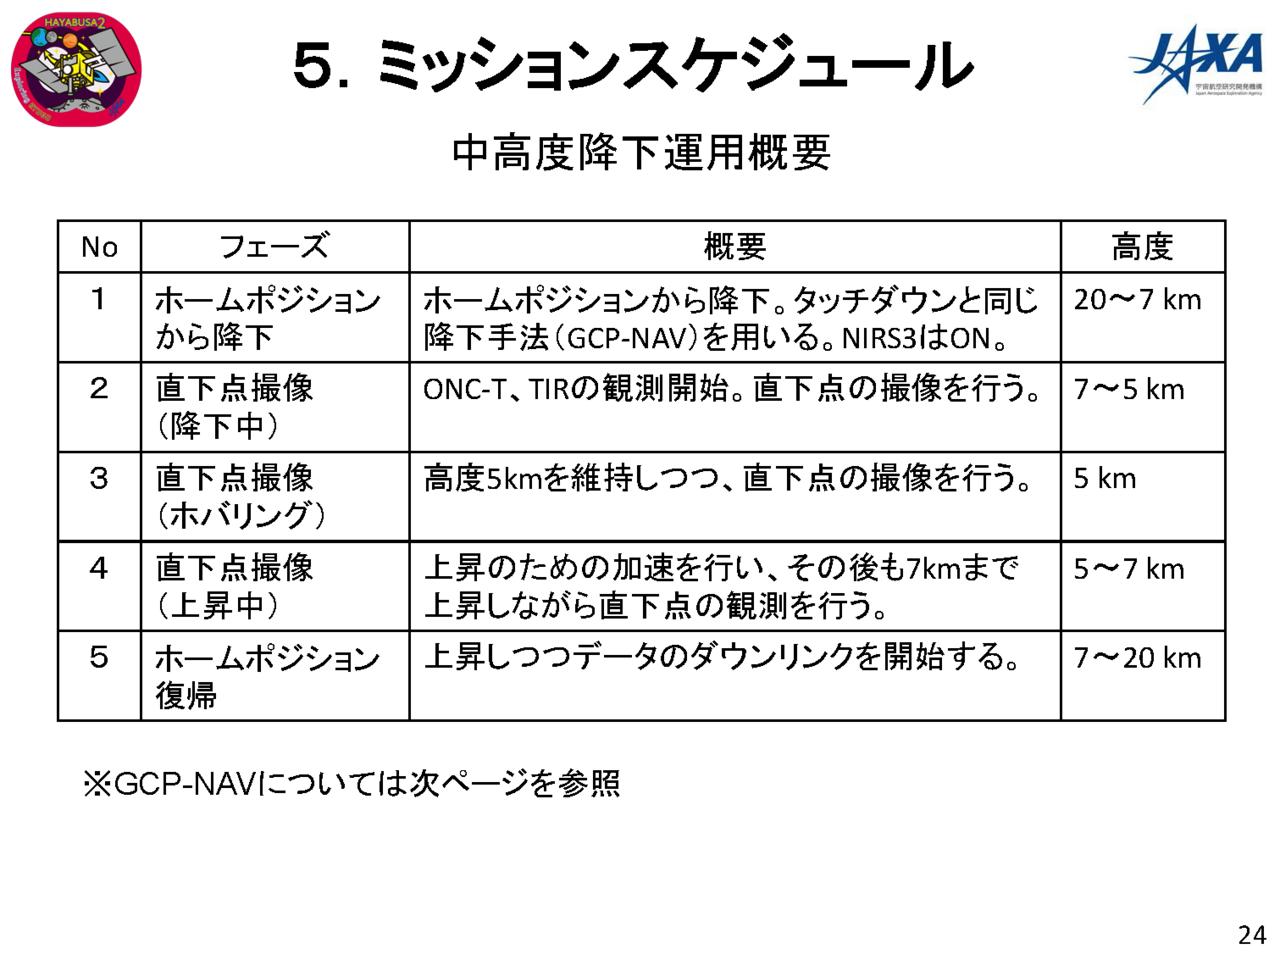 f:id:Imamura:20180802145944p:plain